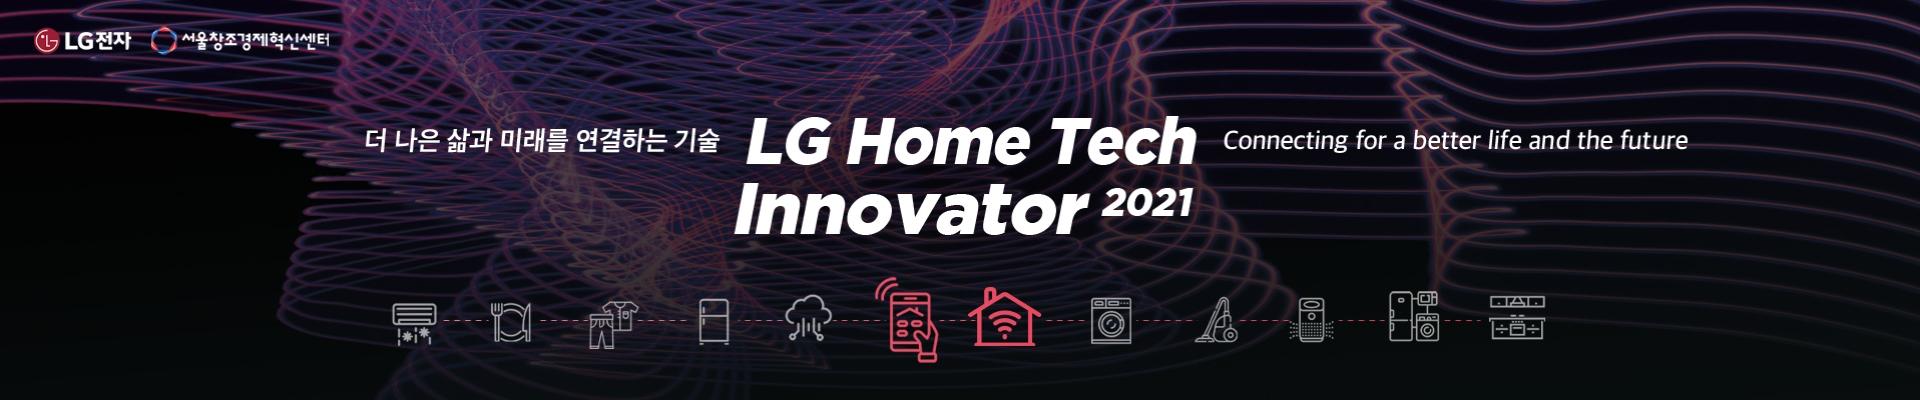 LG HOME TECH INNOVATOR (추가 분야 모집 연장)